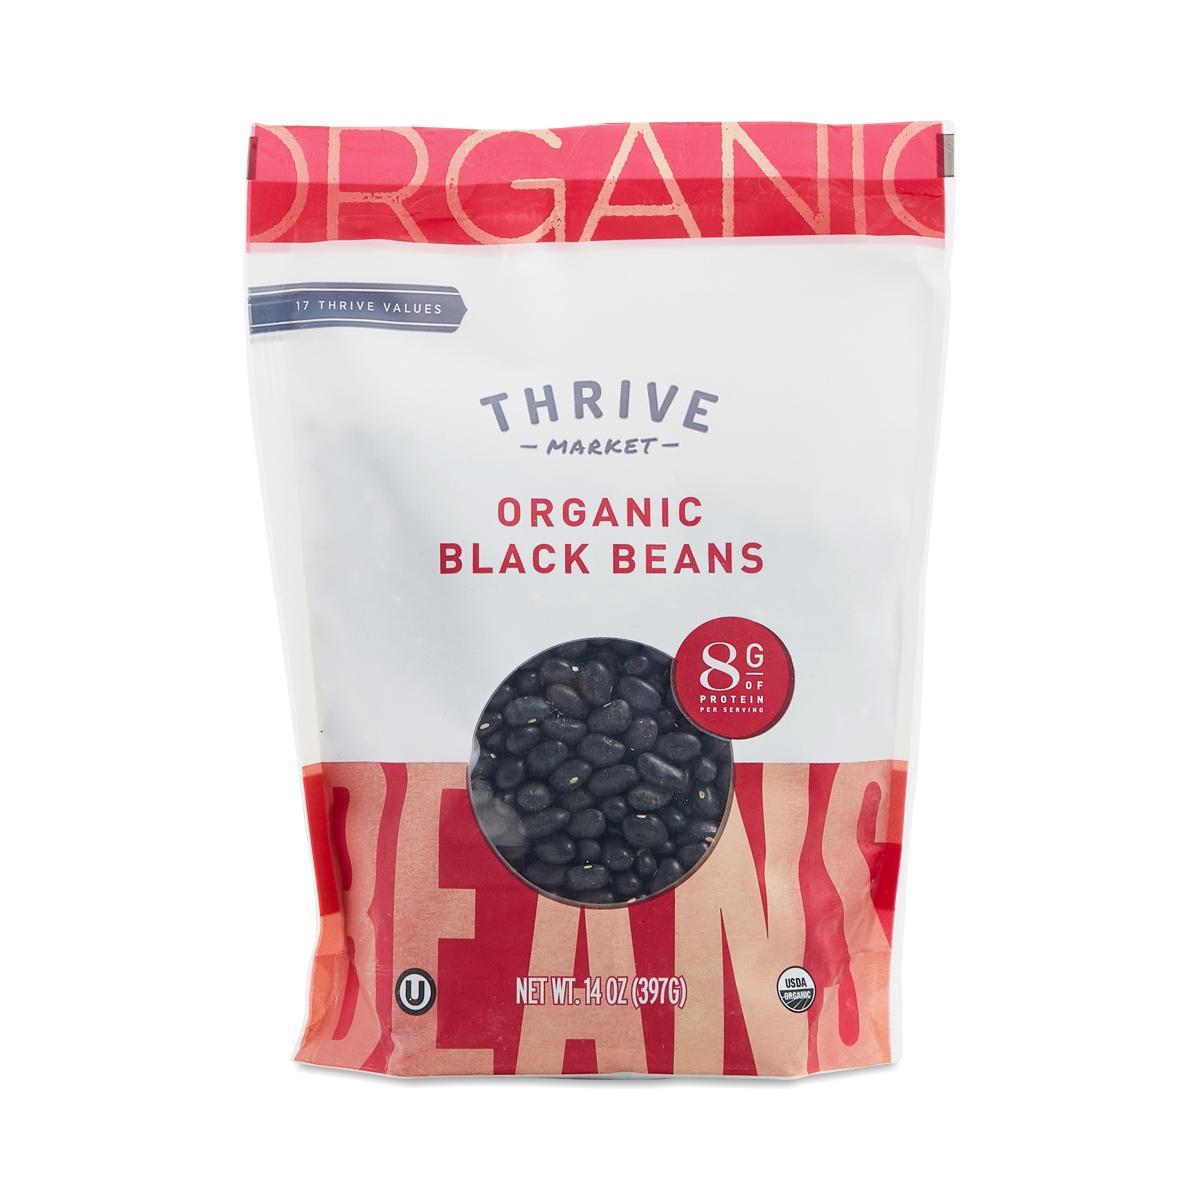 Thrive Market Organic Dried Black Beans 14 oz bag